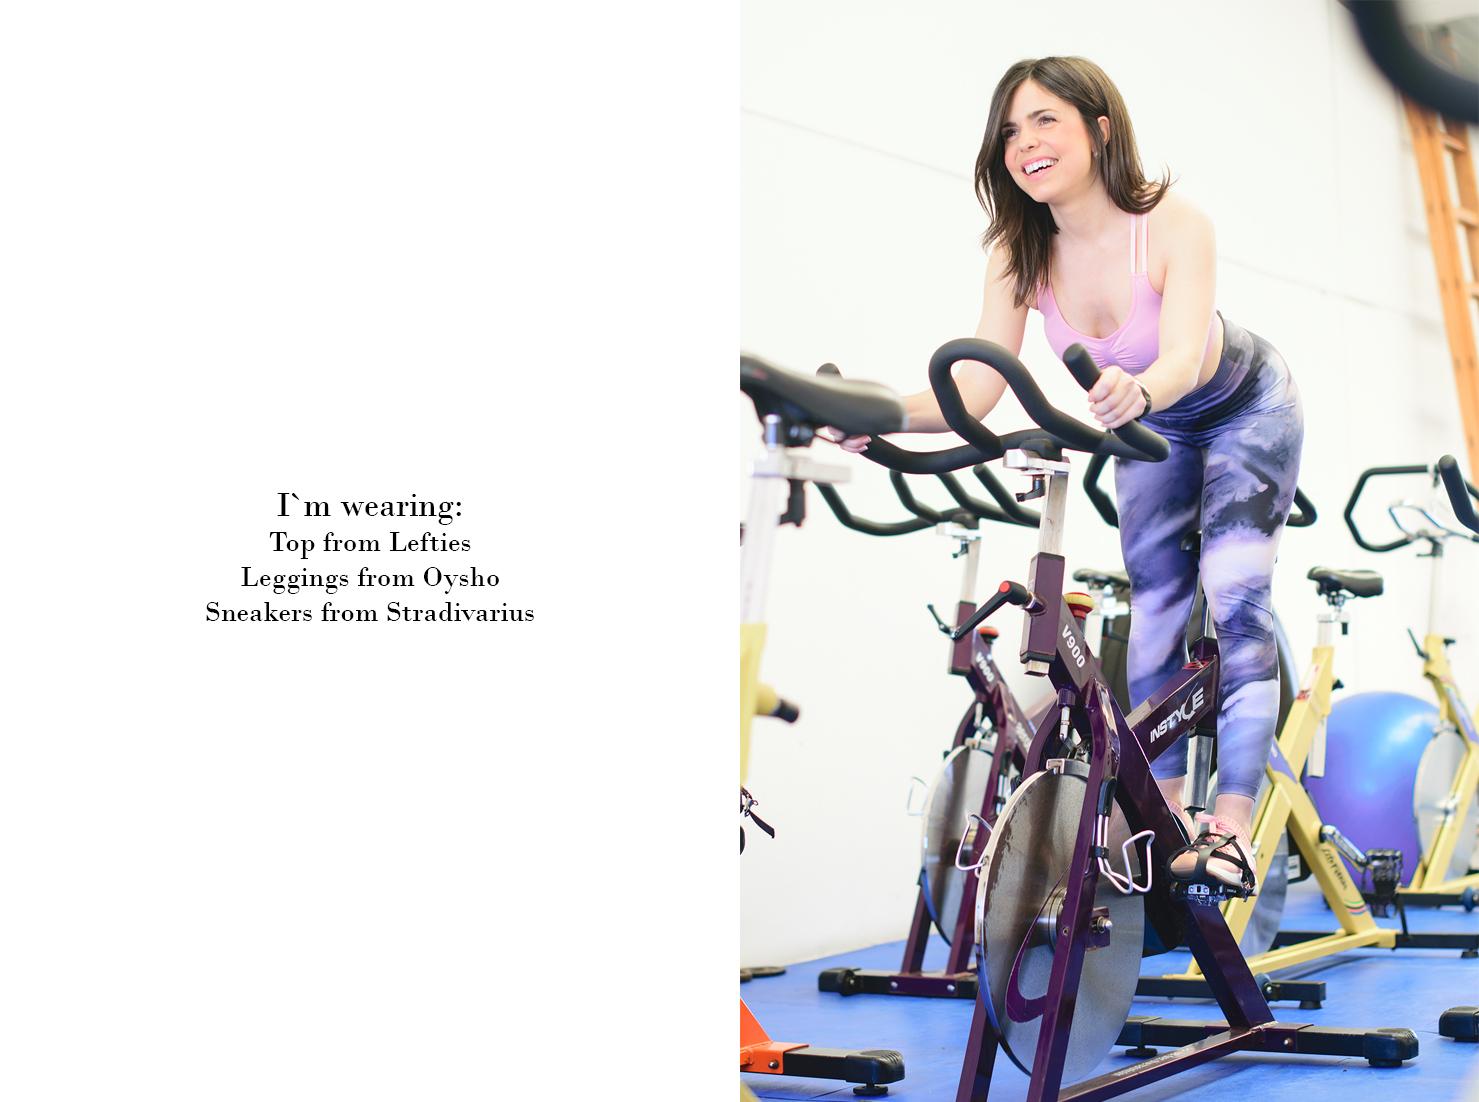 Ponteunostacones fitness dieta definicion